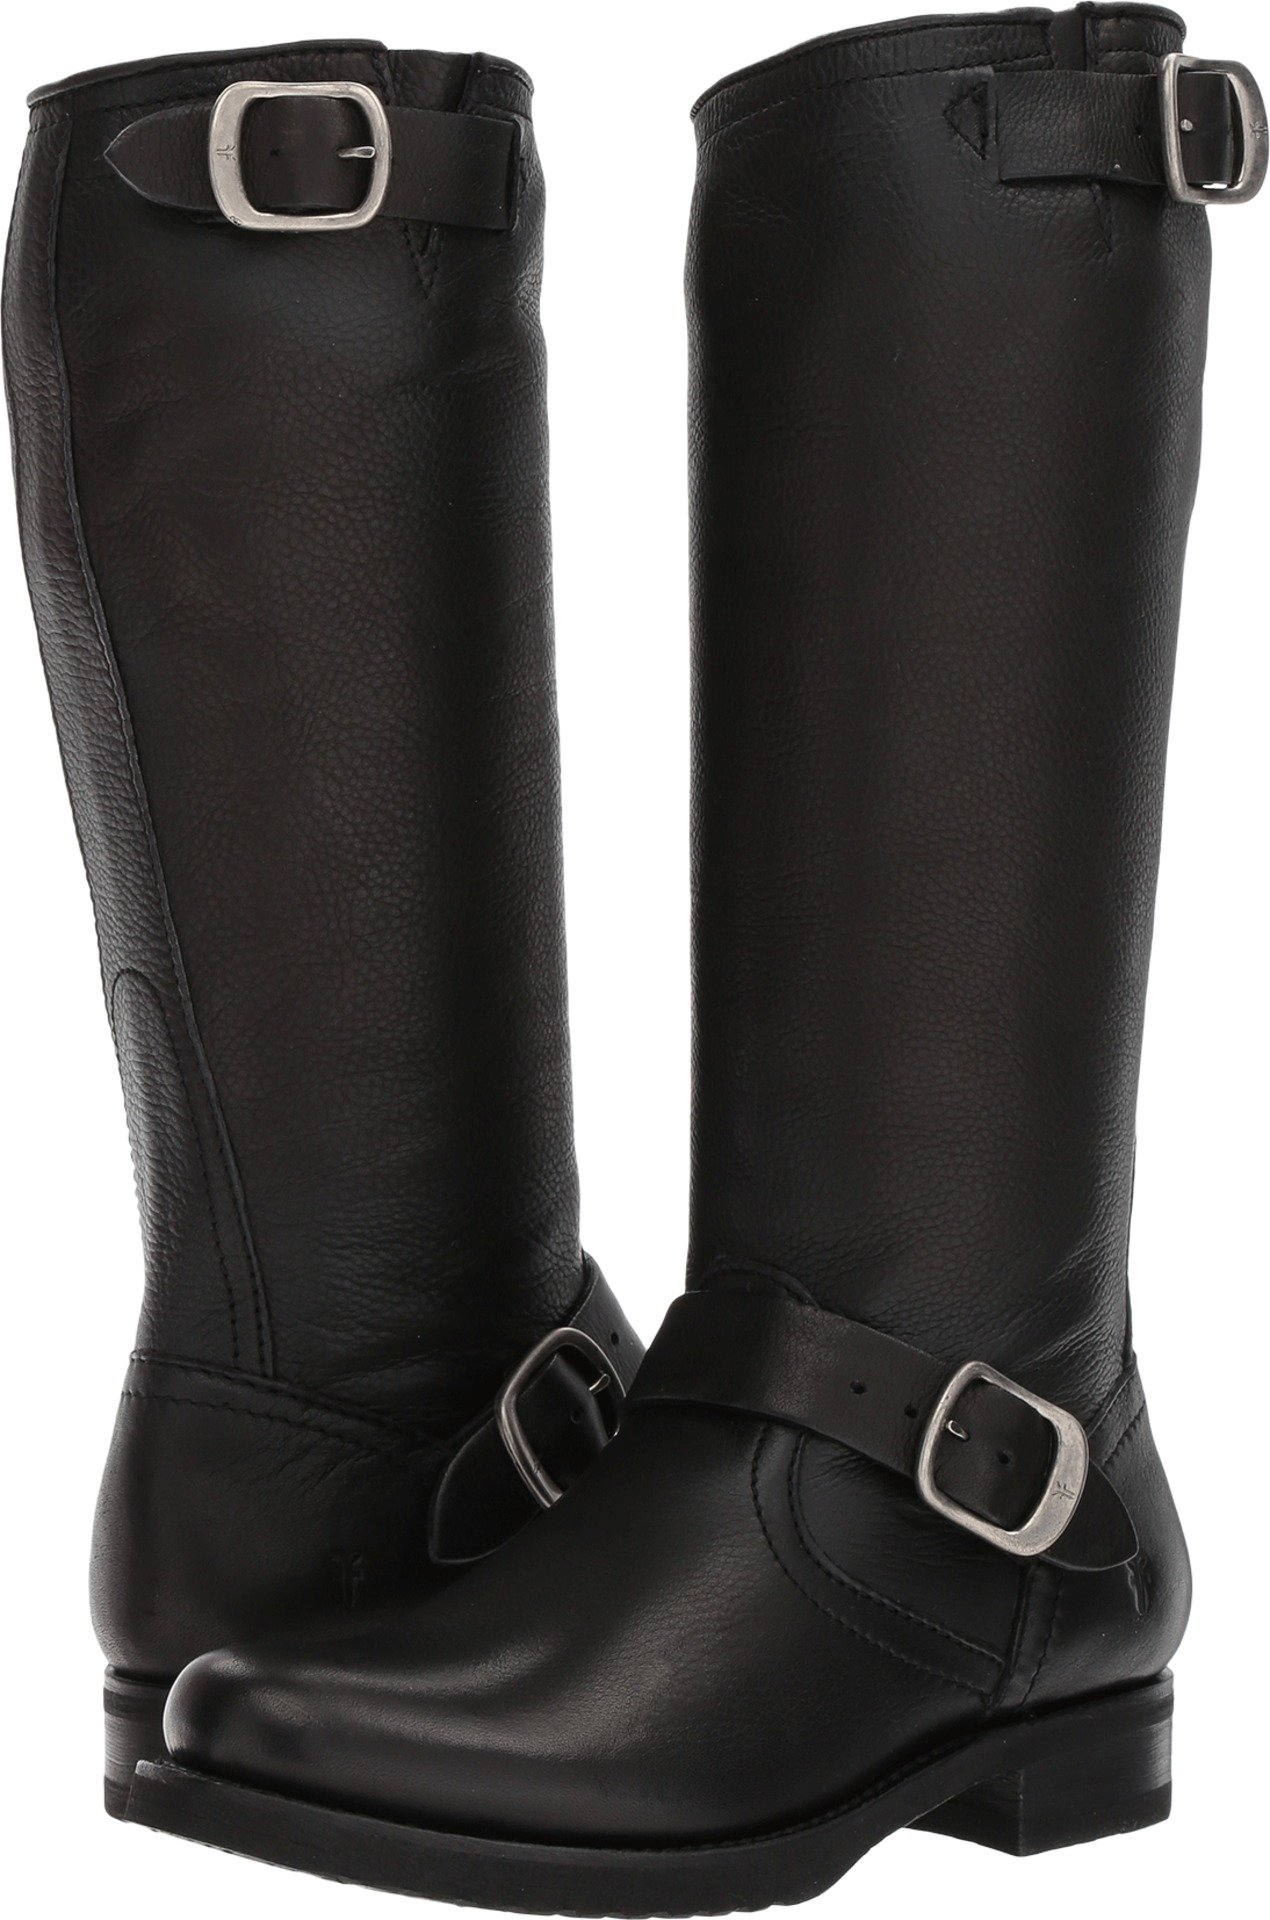 FRYE Women's Veronica 2 Slouch Boot, Black, 8 M US